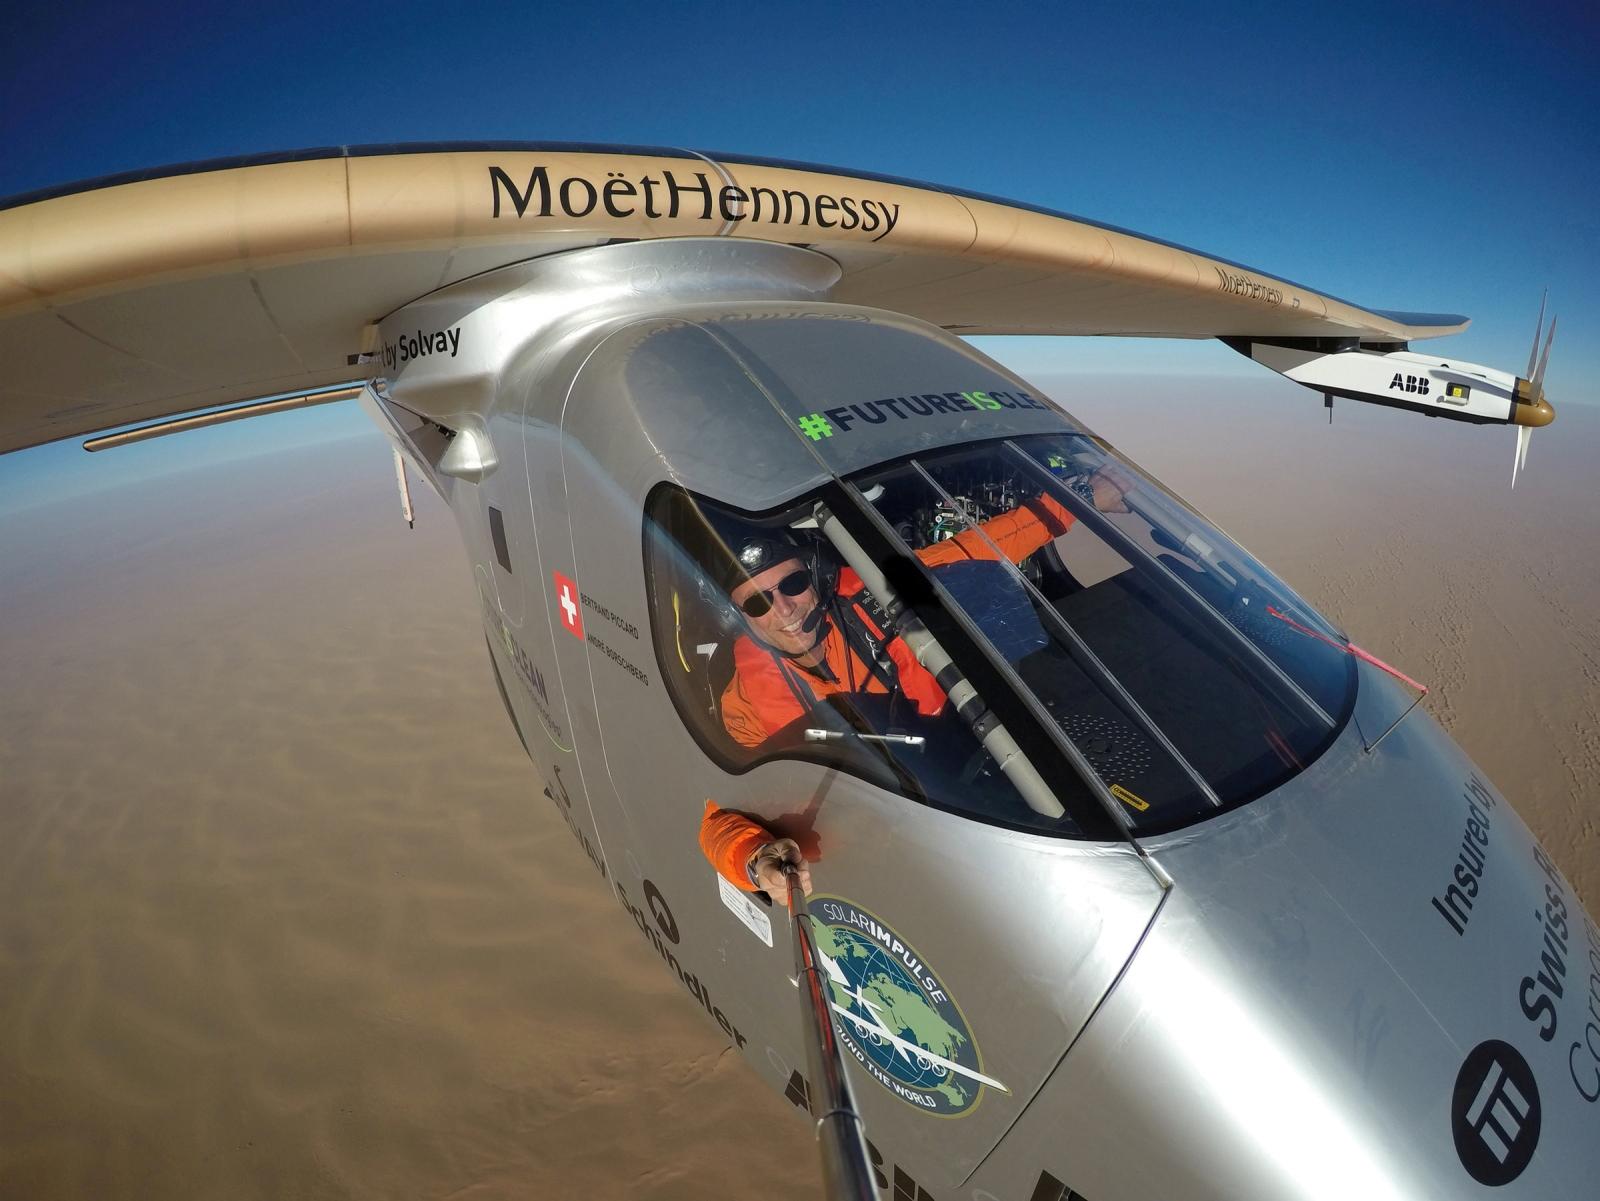 Solar Power plane